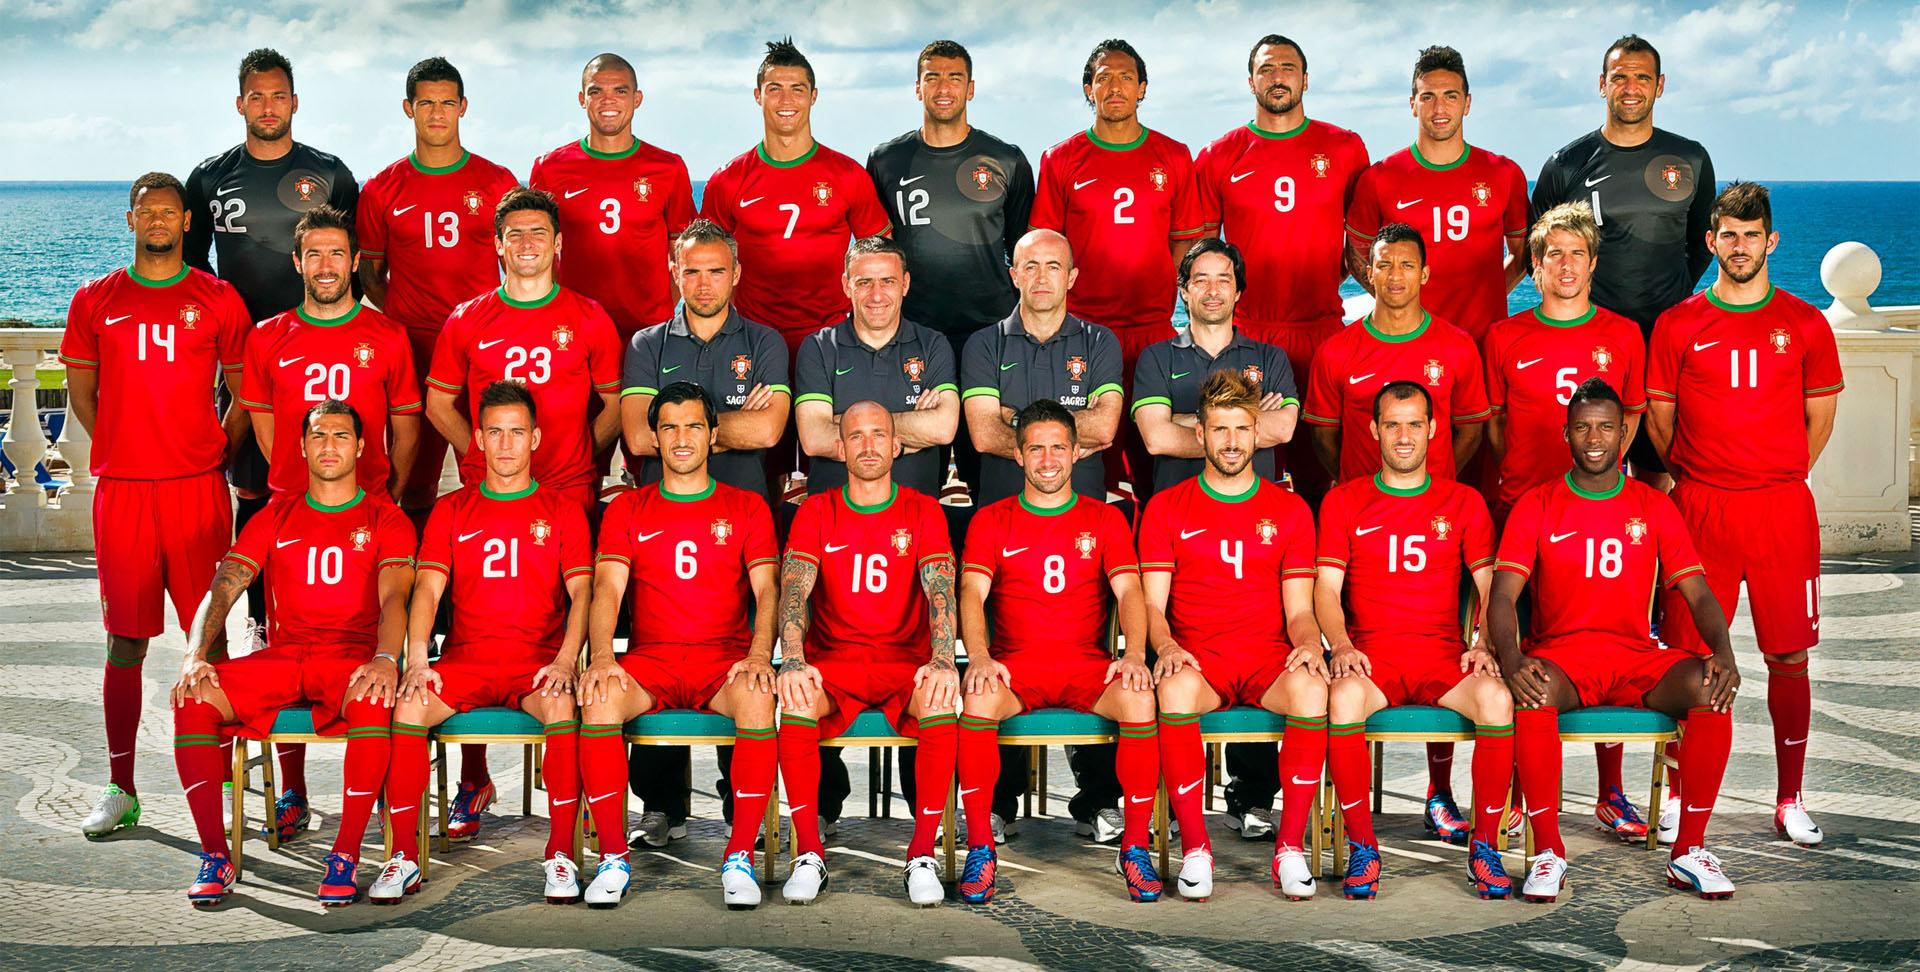 Portugal Football Team Wallpapers HD Desktop Backgrounds 1920x972